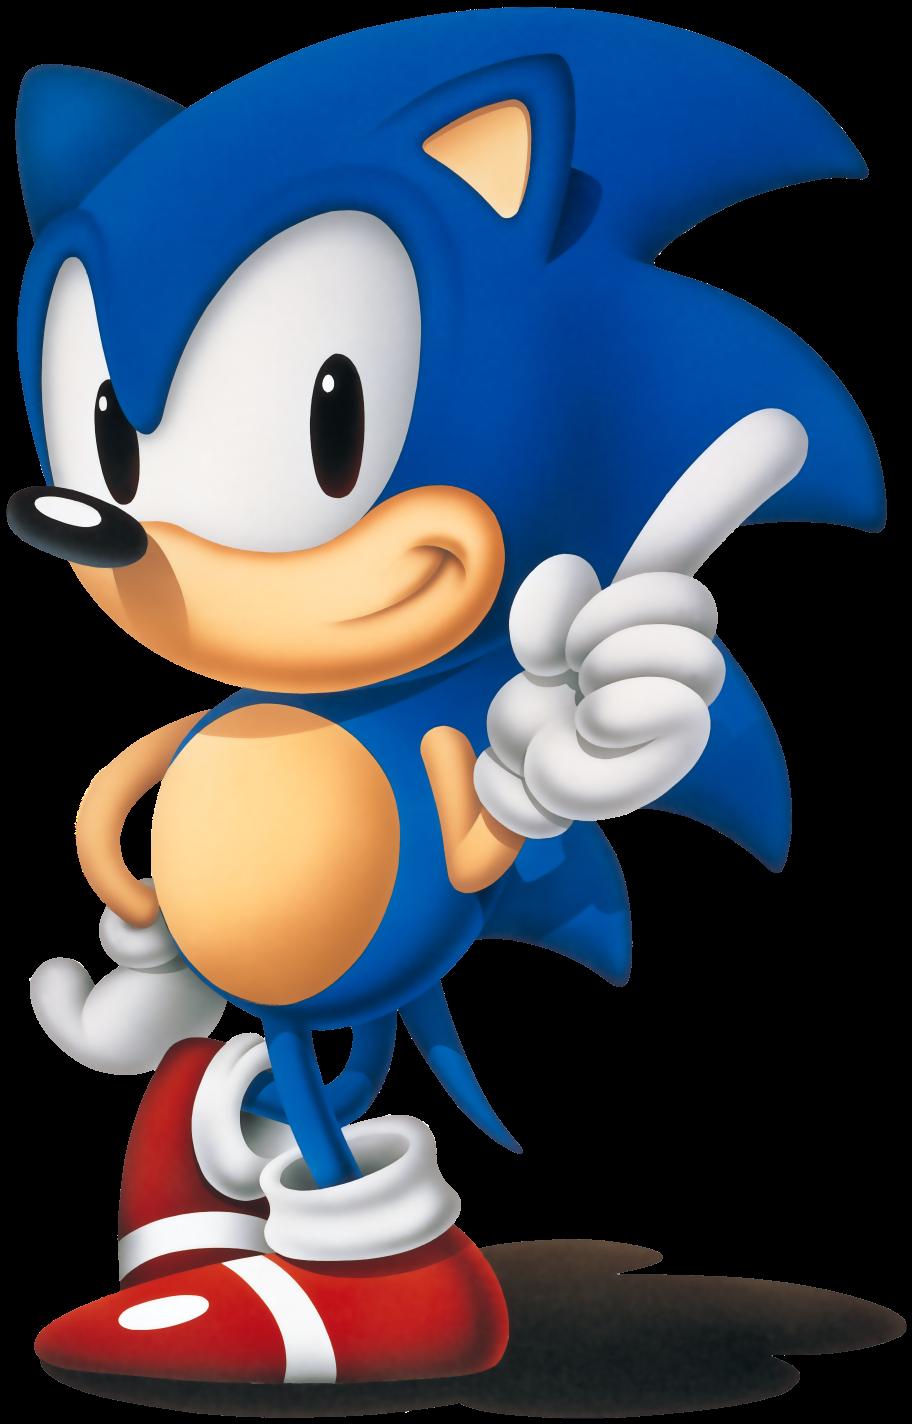 Sonic the Hedgehog (?????????????)